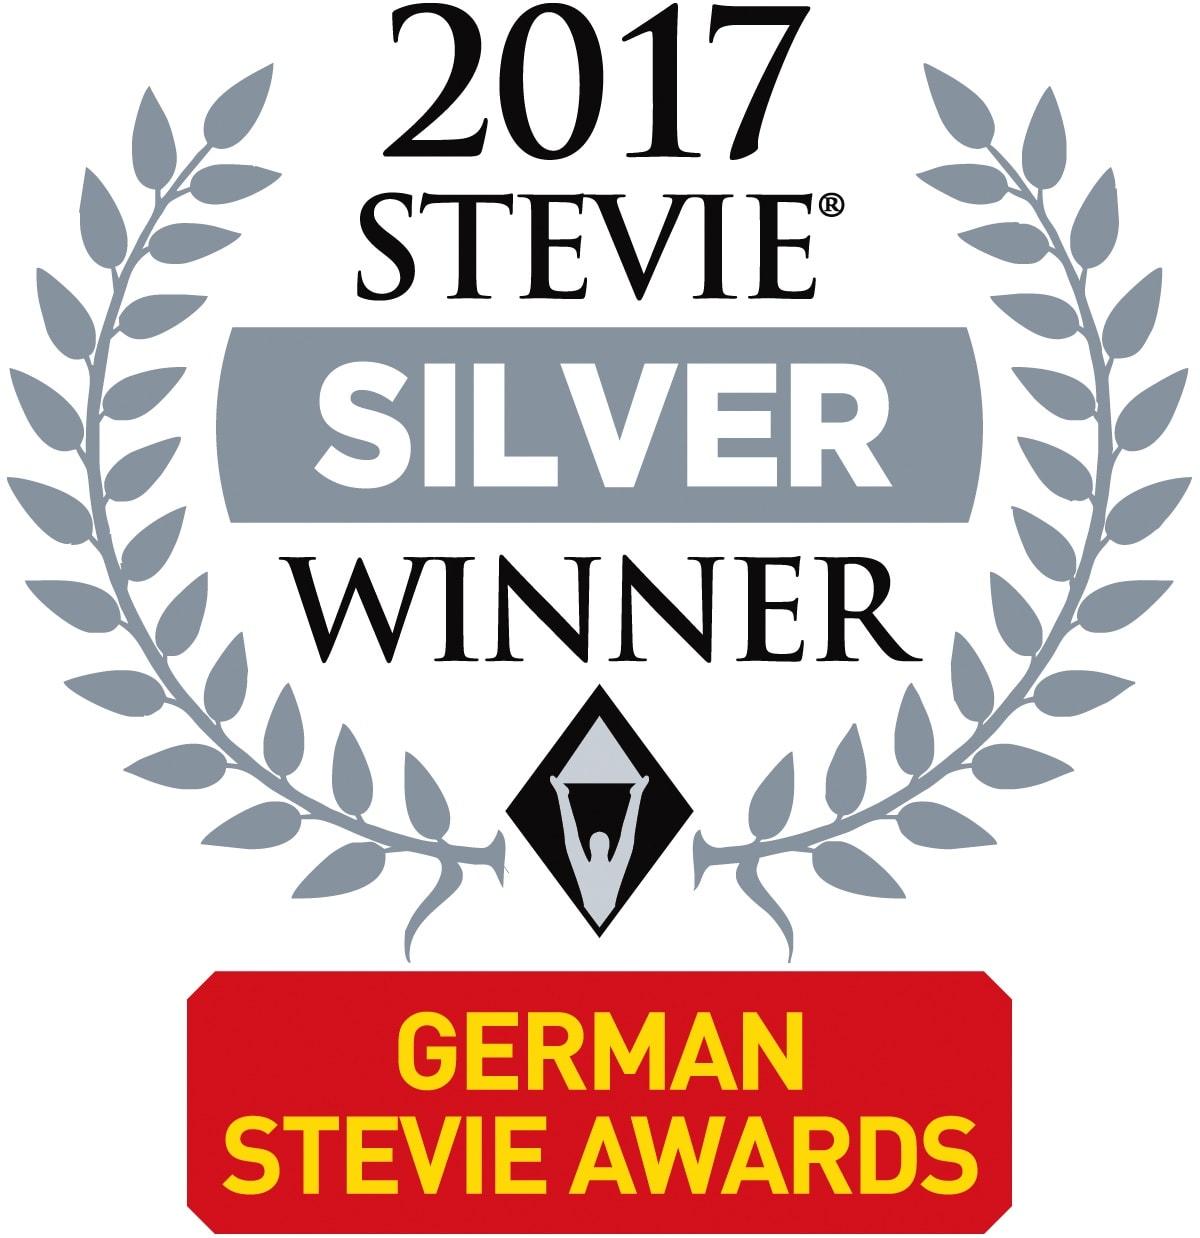 German Stevie Awards Logo: signavio 2 silver stevie awards